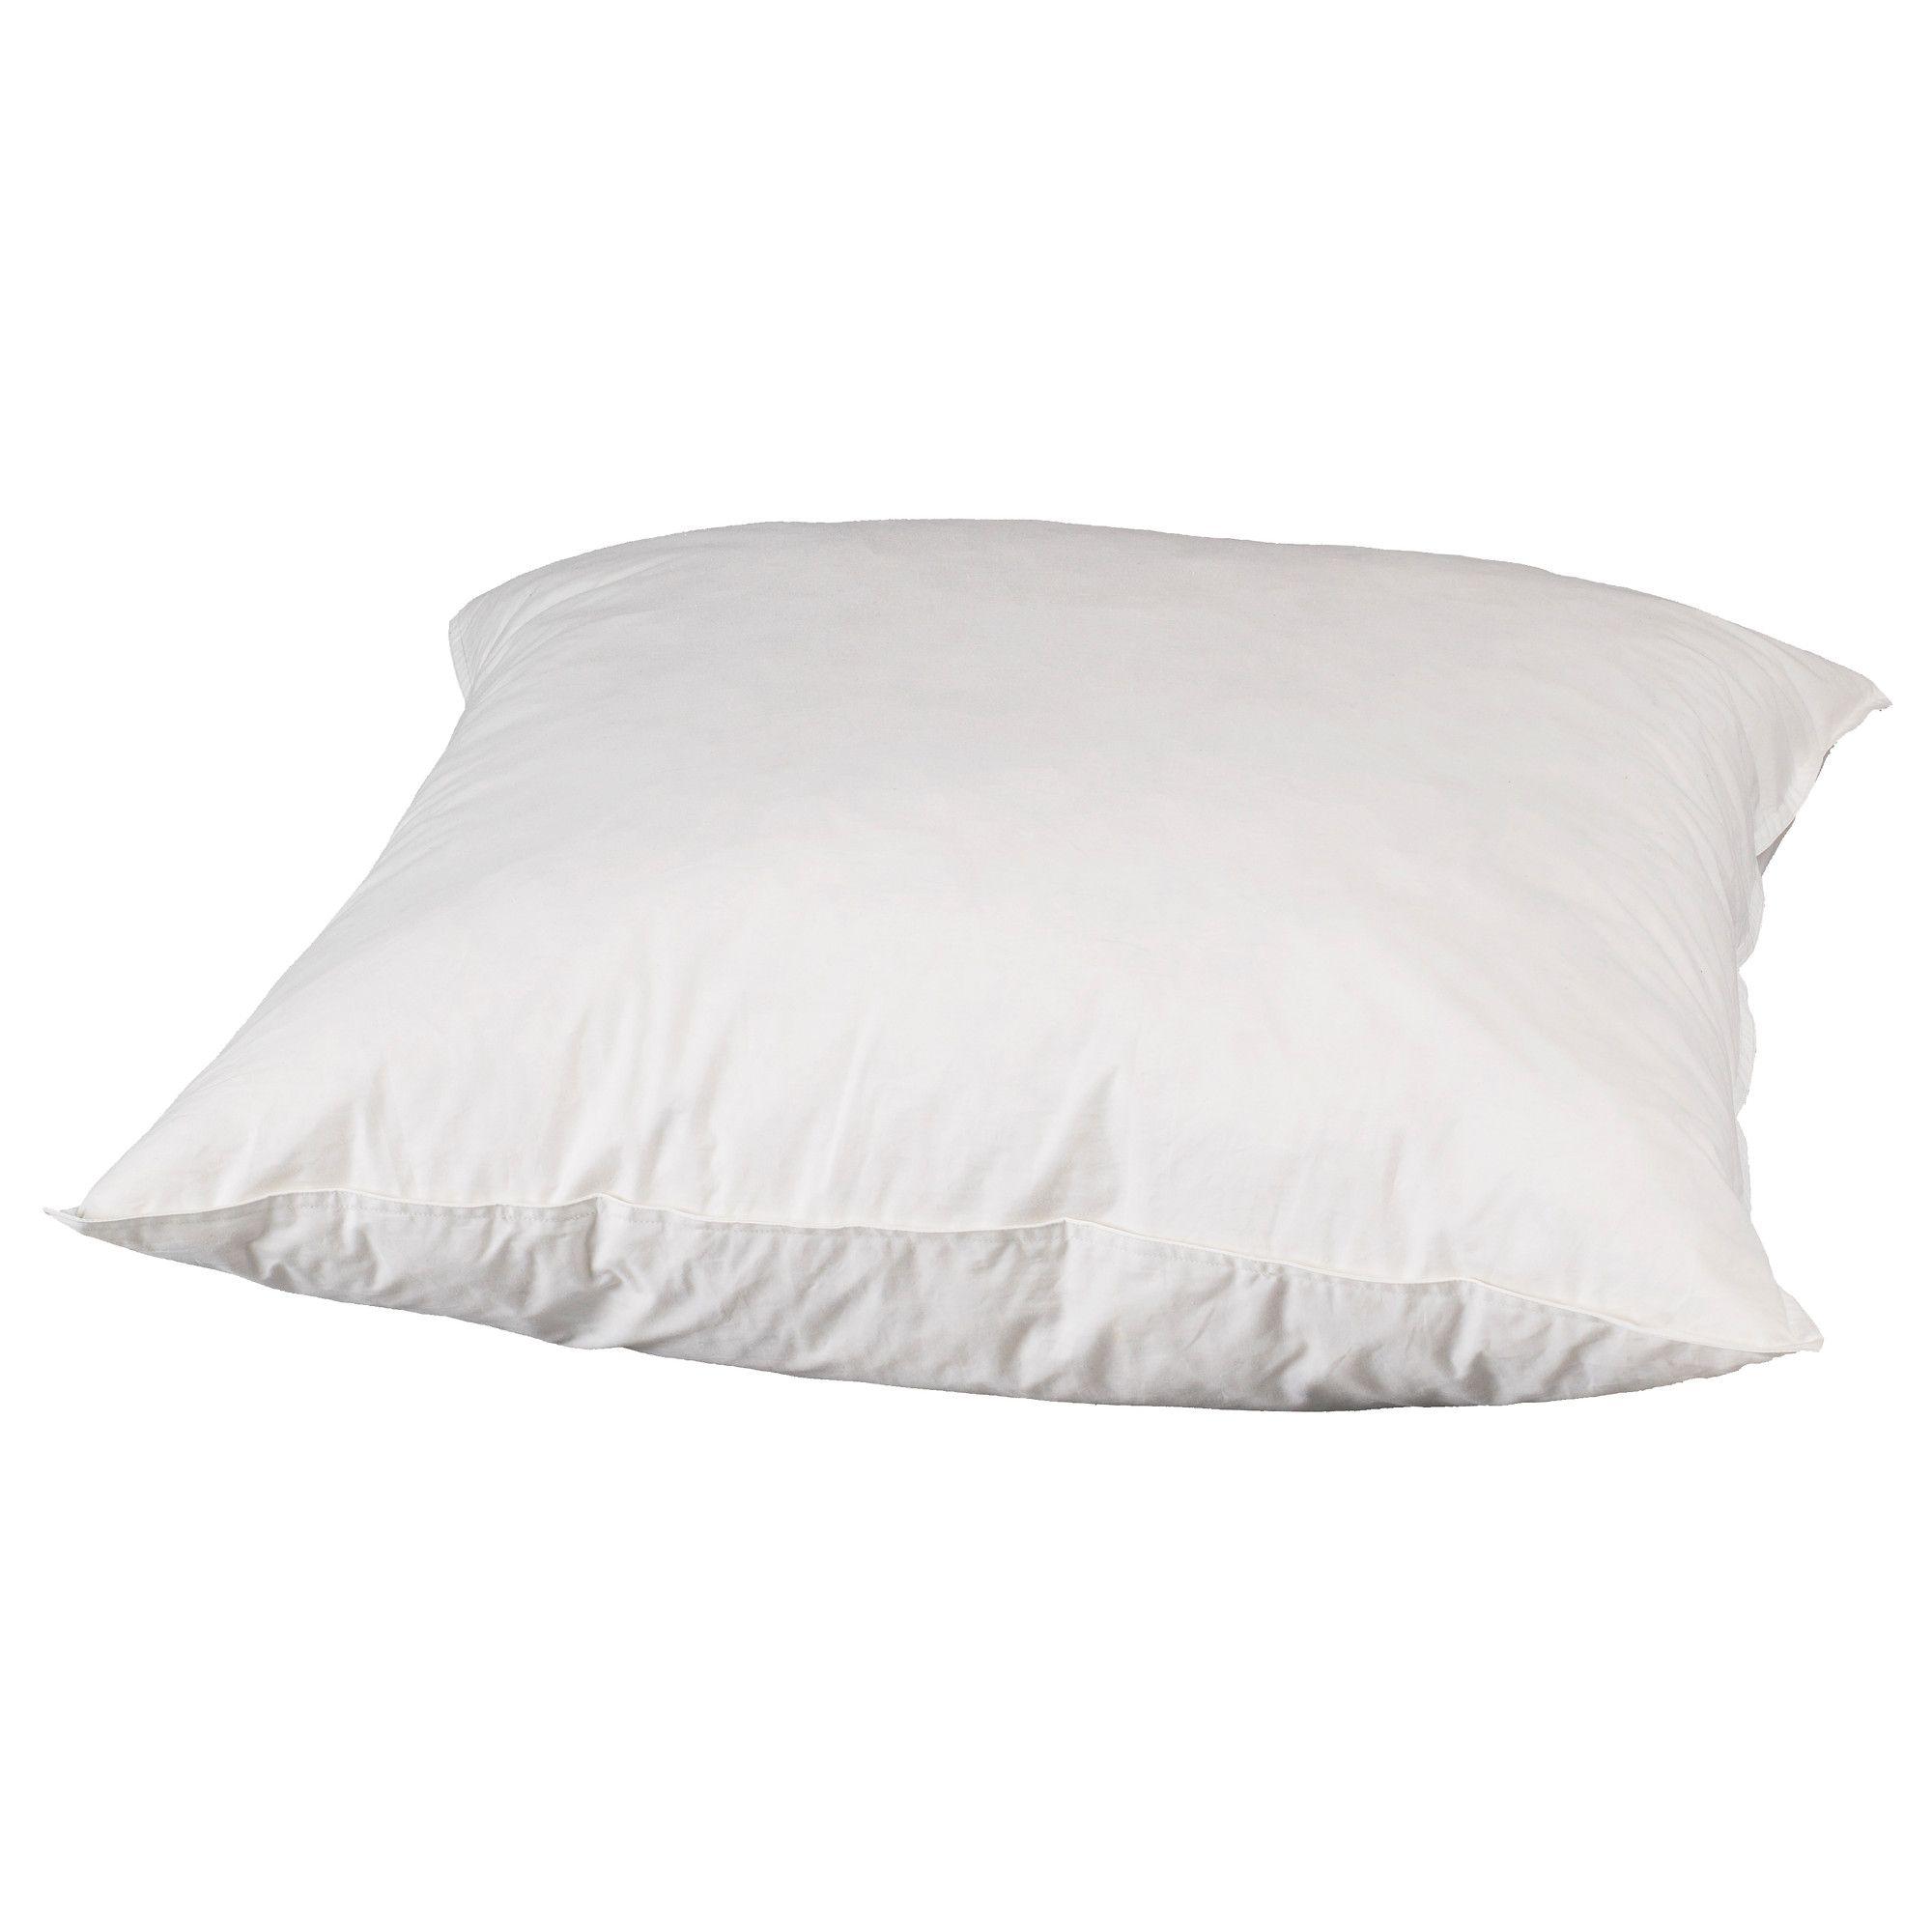 gosa tulpan pillow ikea 12 00 26 european square for guest room